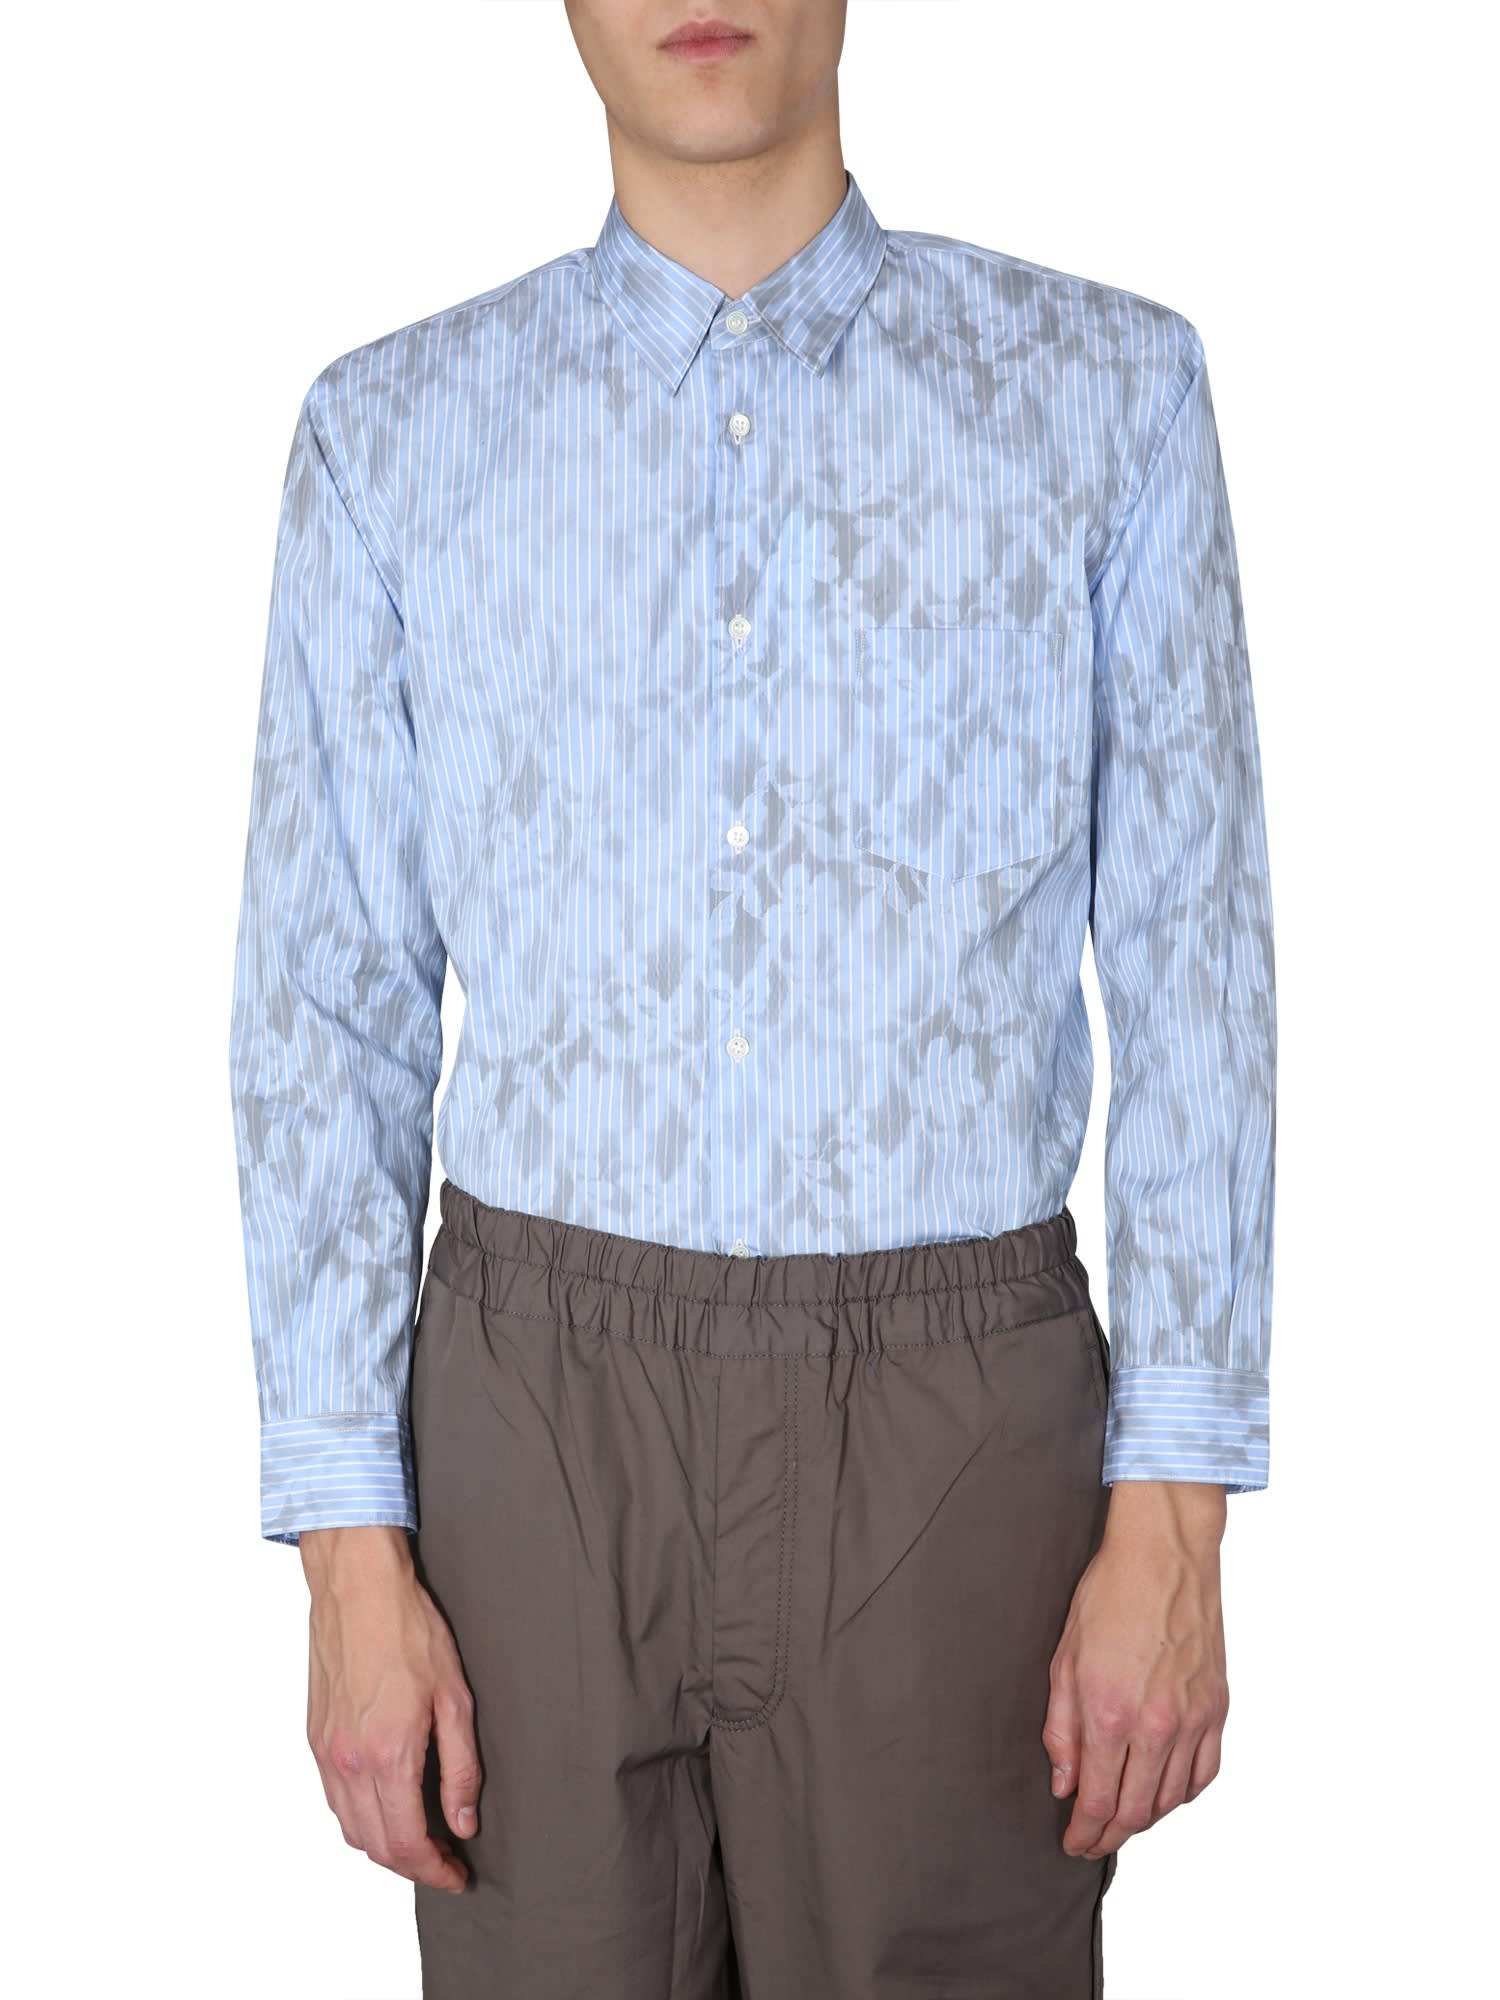 Comme des Garçons Shirt Printed Shirt